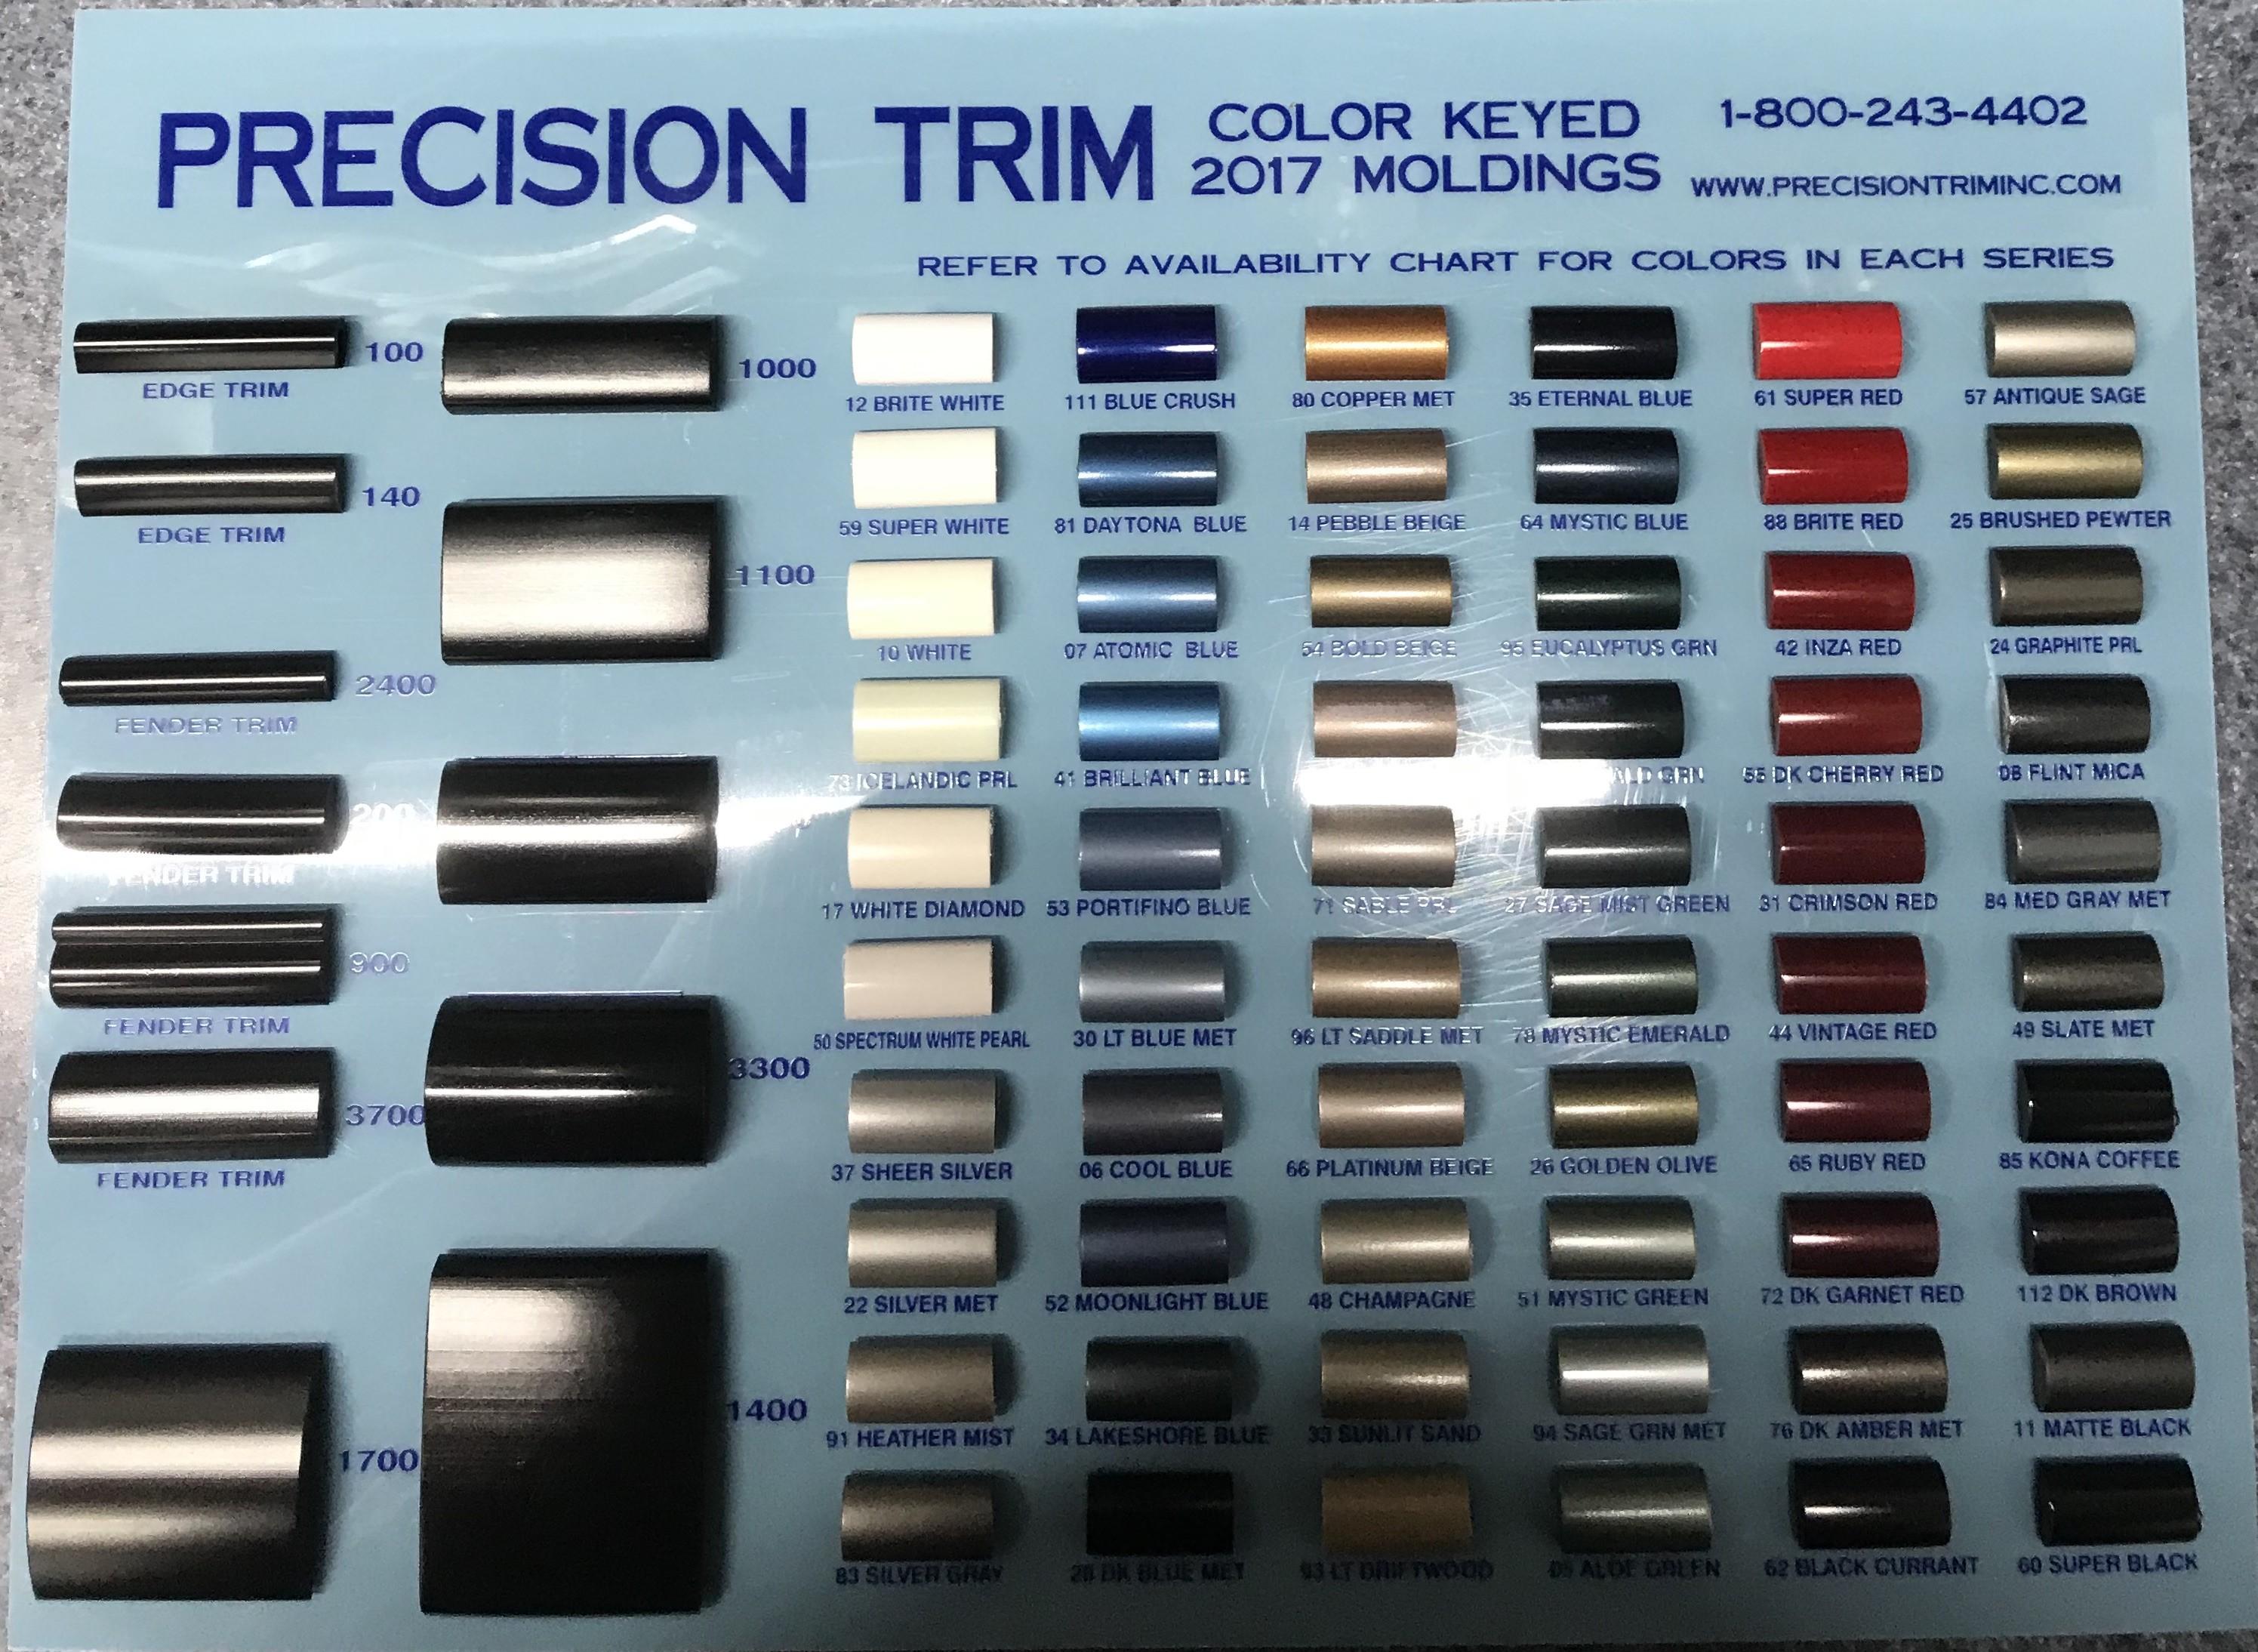 Precision Trim 140 Series